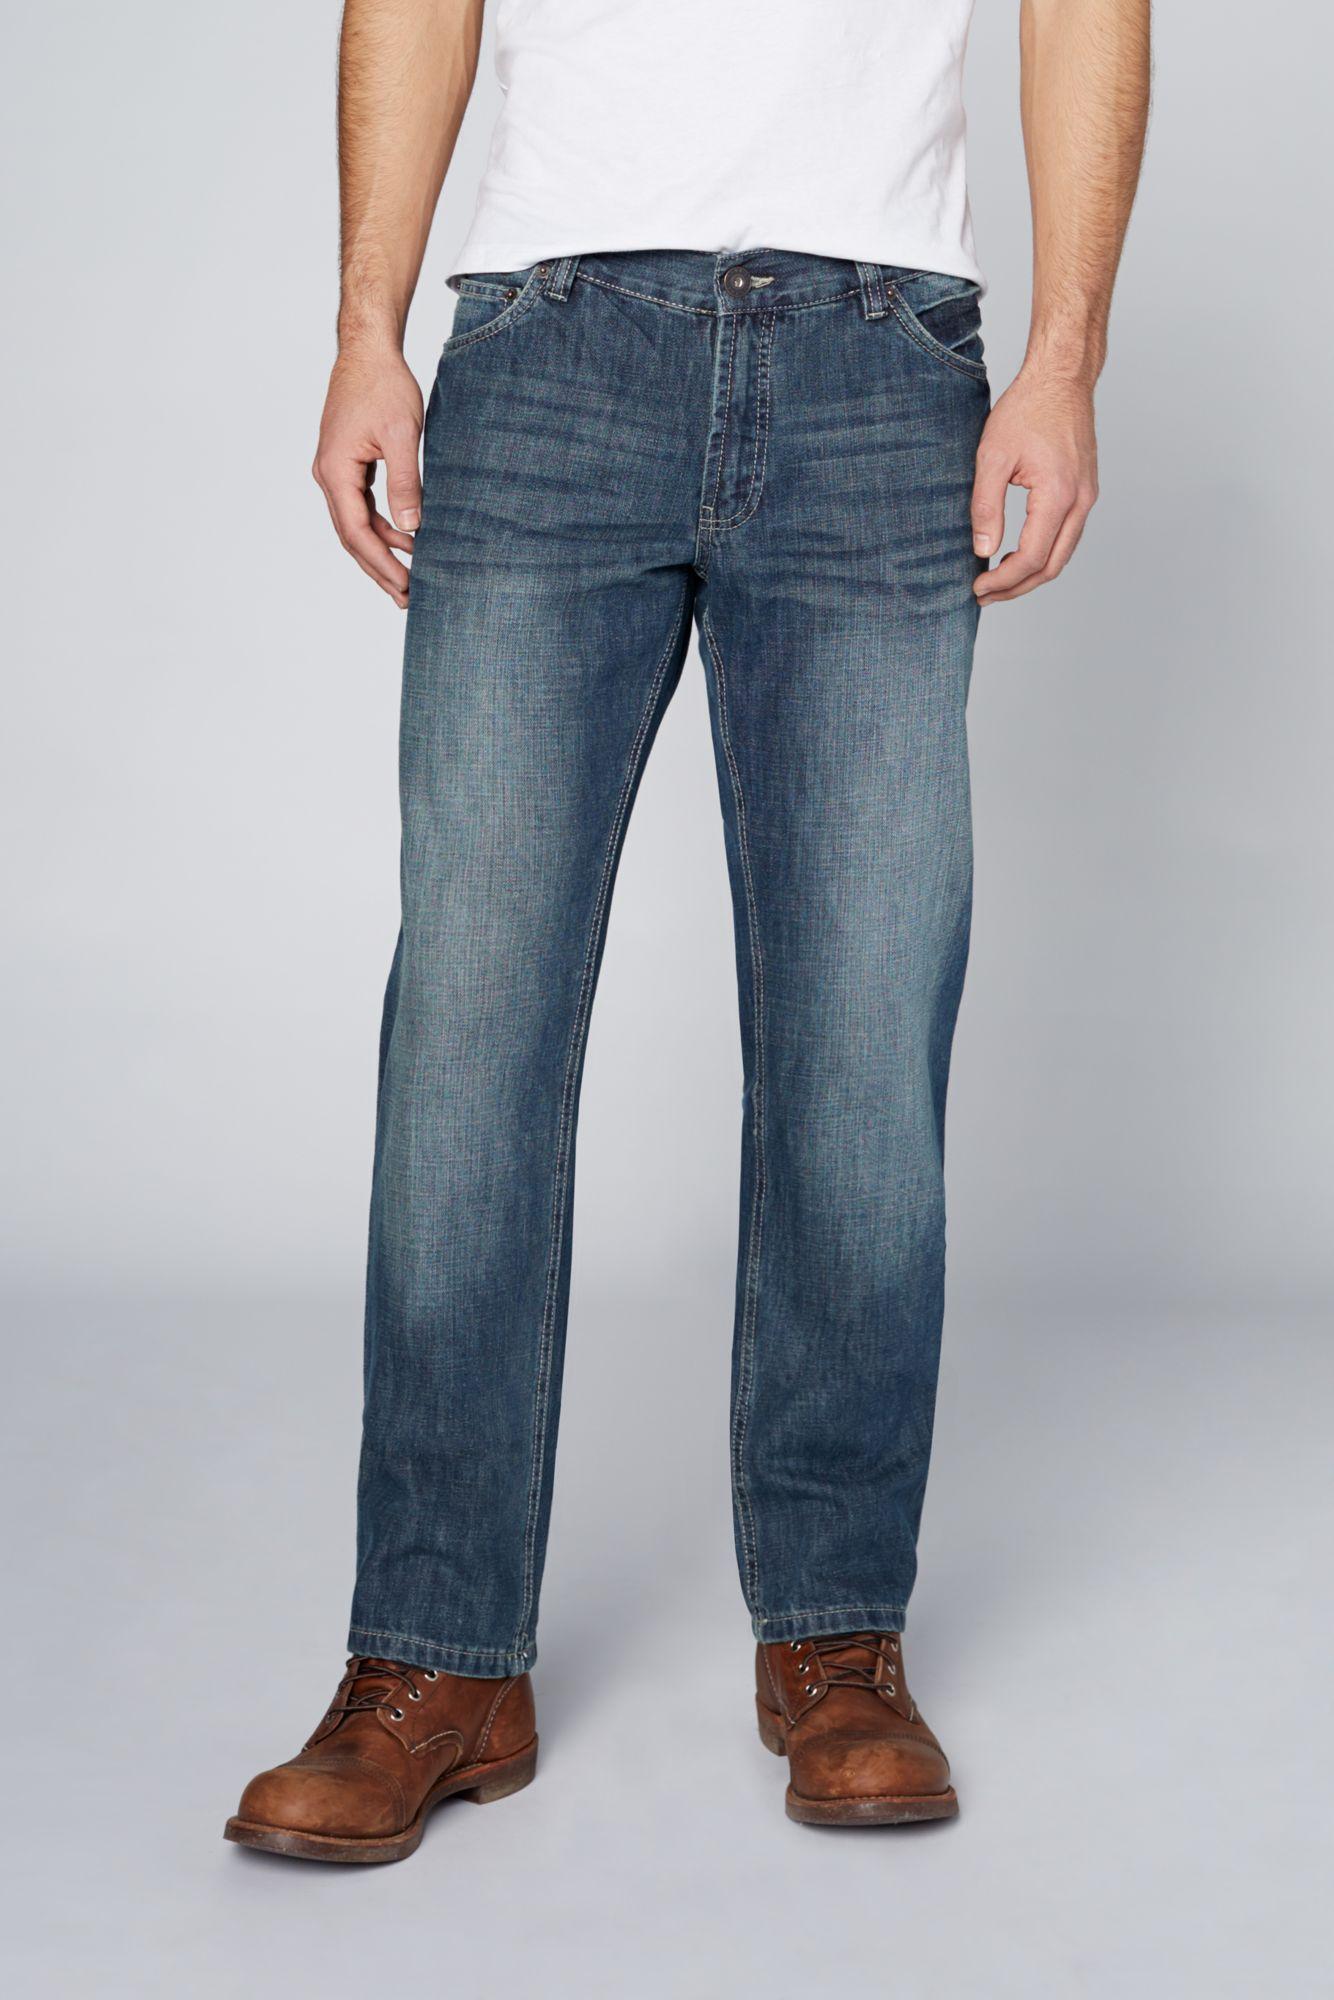 COLORADO DENIM  Jeans »C916 LAKE Herren Jeans«